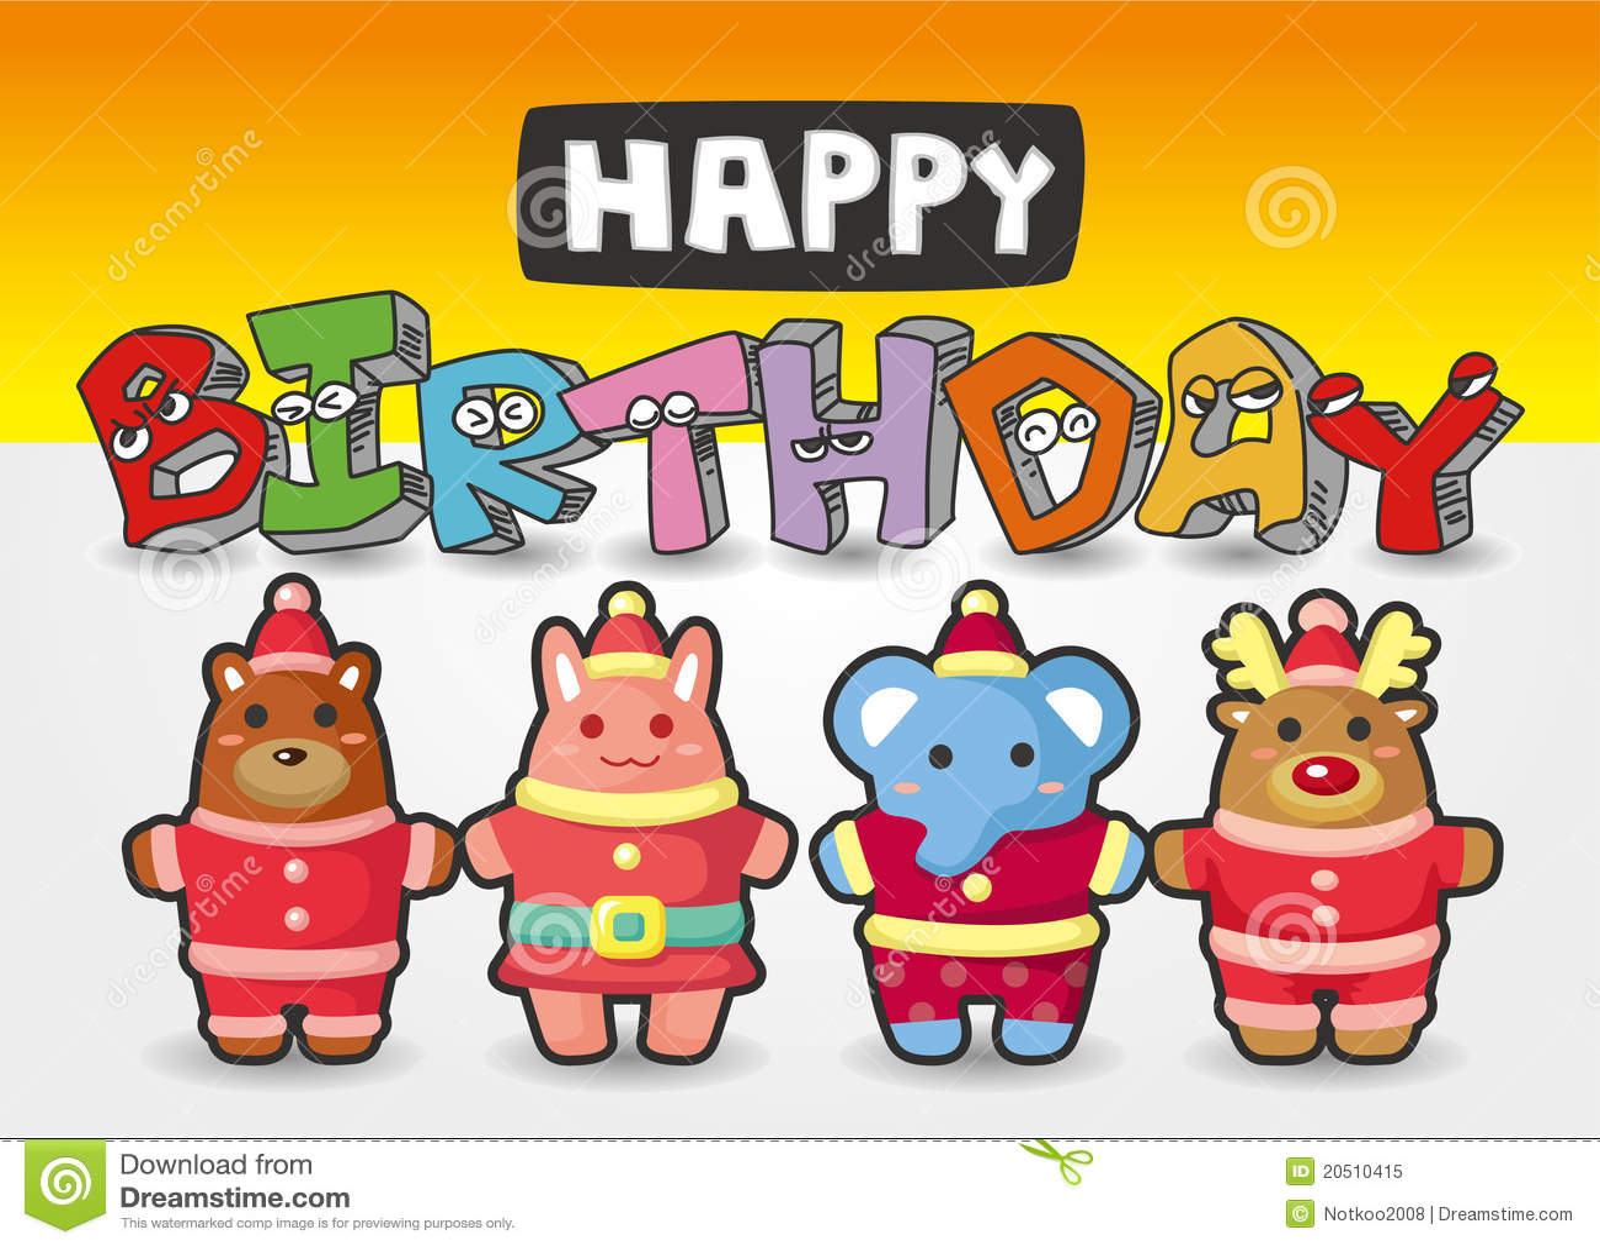 Cartoon Animal Birthday Card Royalty Free Stock Photo